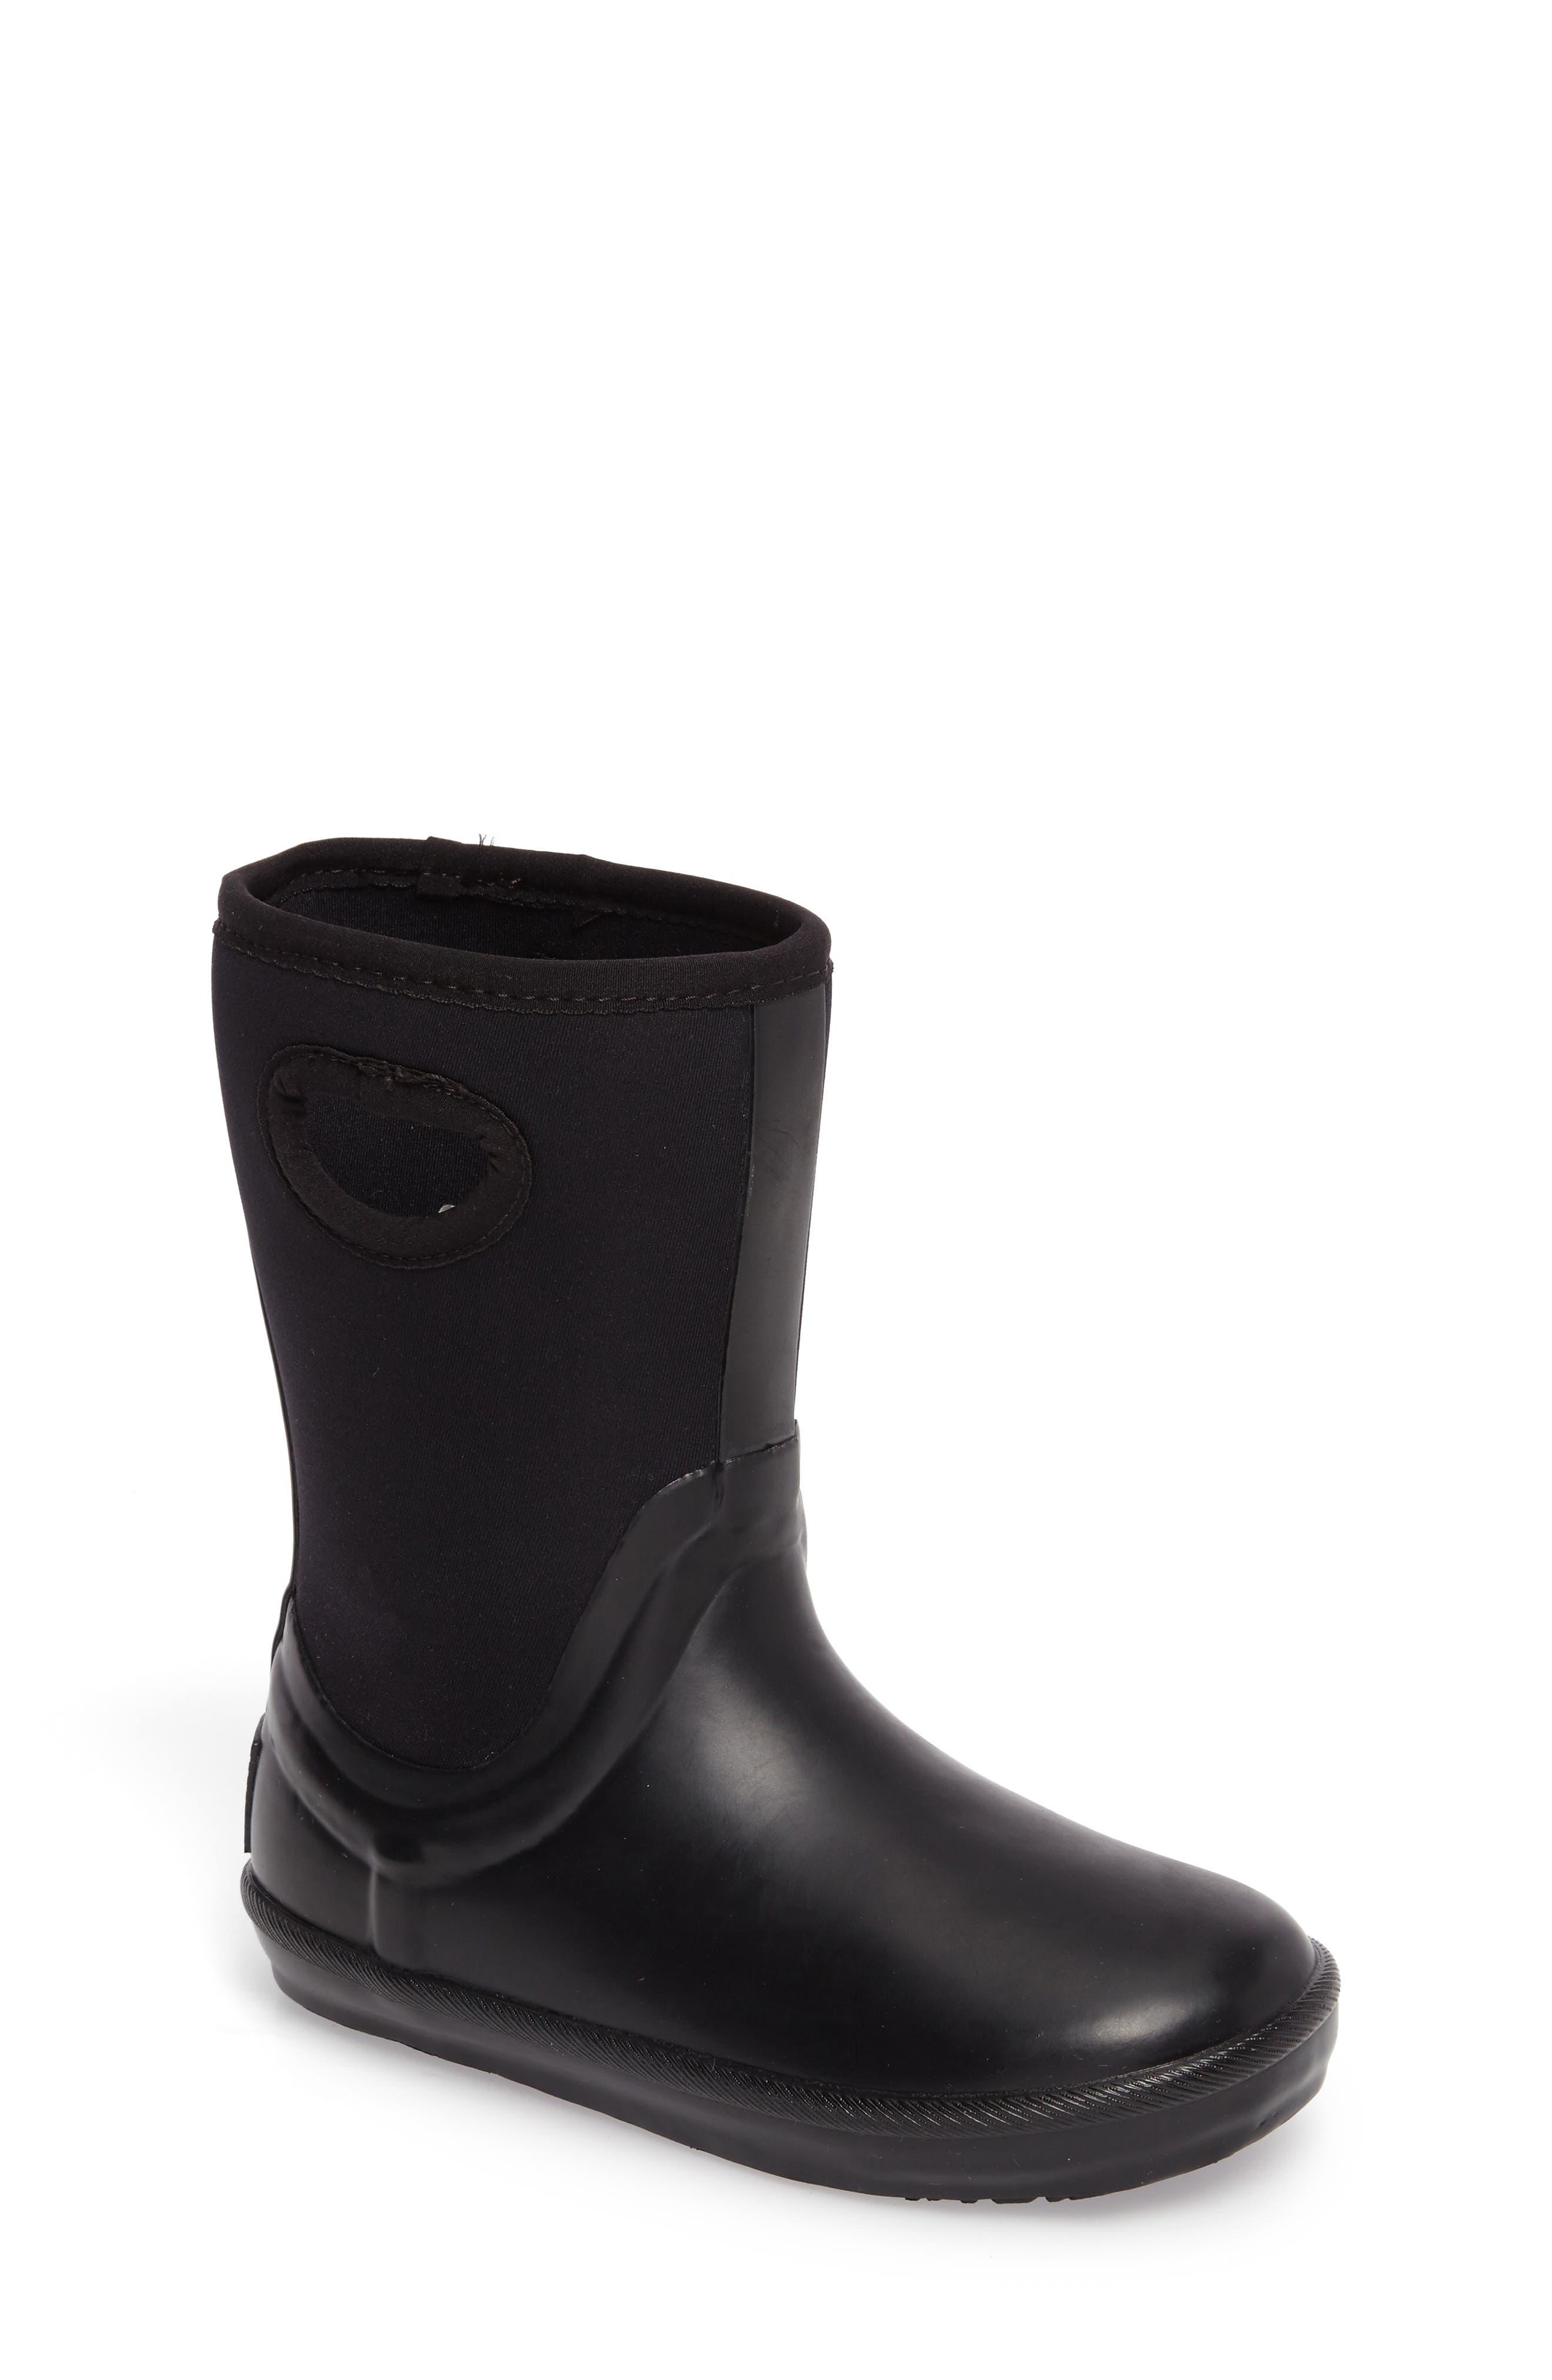 Kex Waterproof Boot,                         Main,                         color,